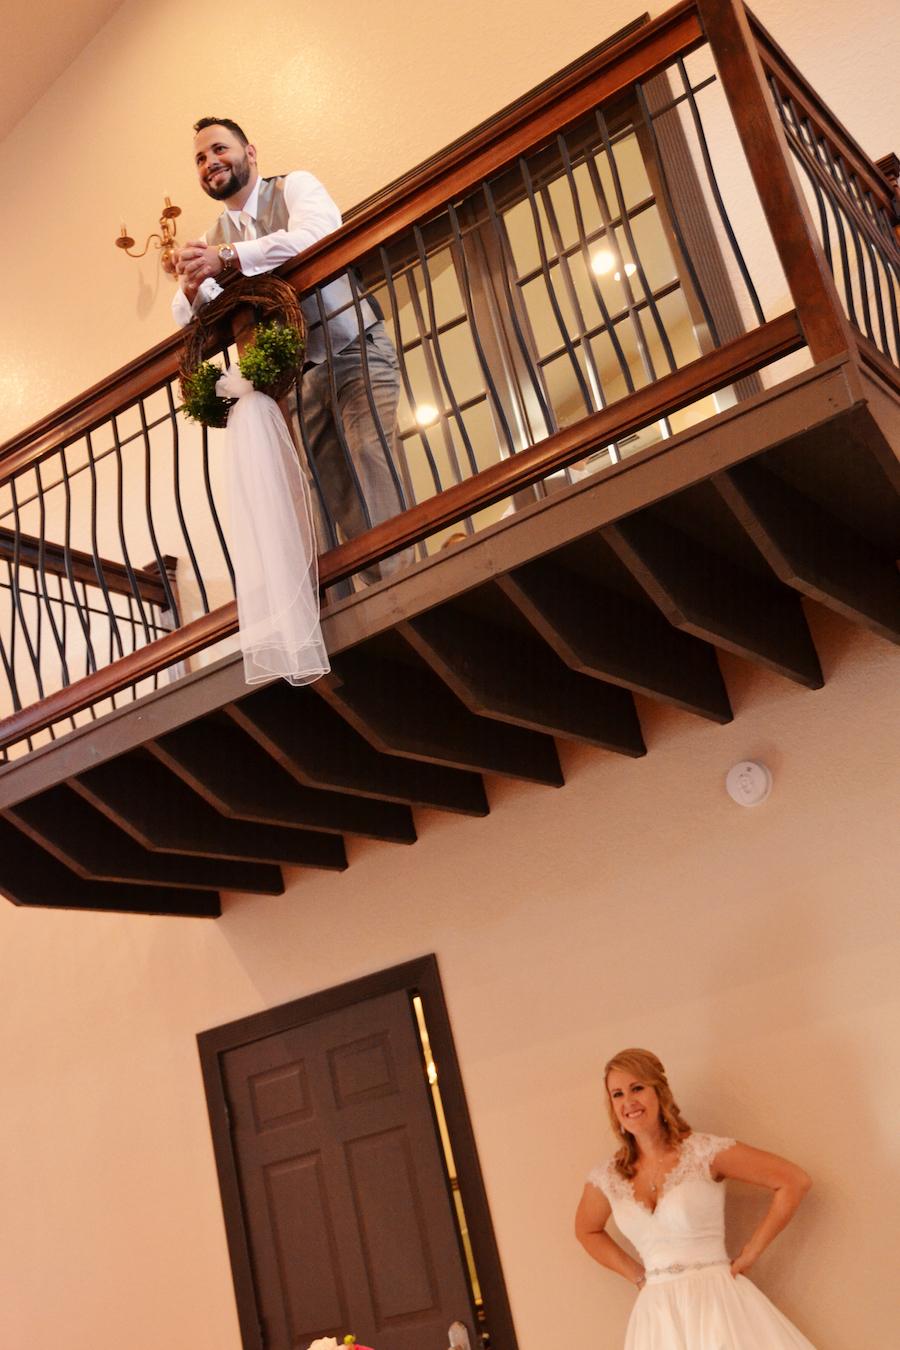 Sarasota Bride and Groom First Look on Wedding Day | Sarasota Wedding Venue Bakers Ranch